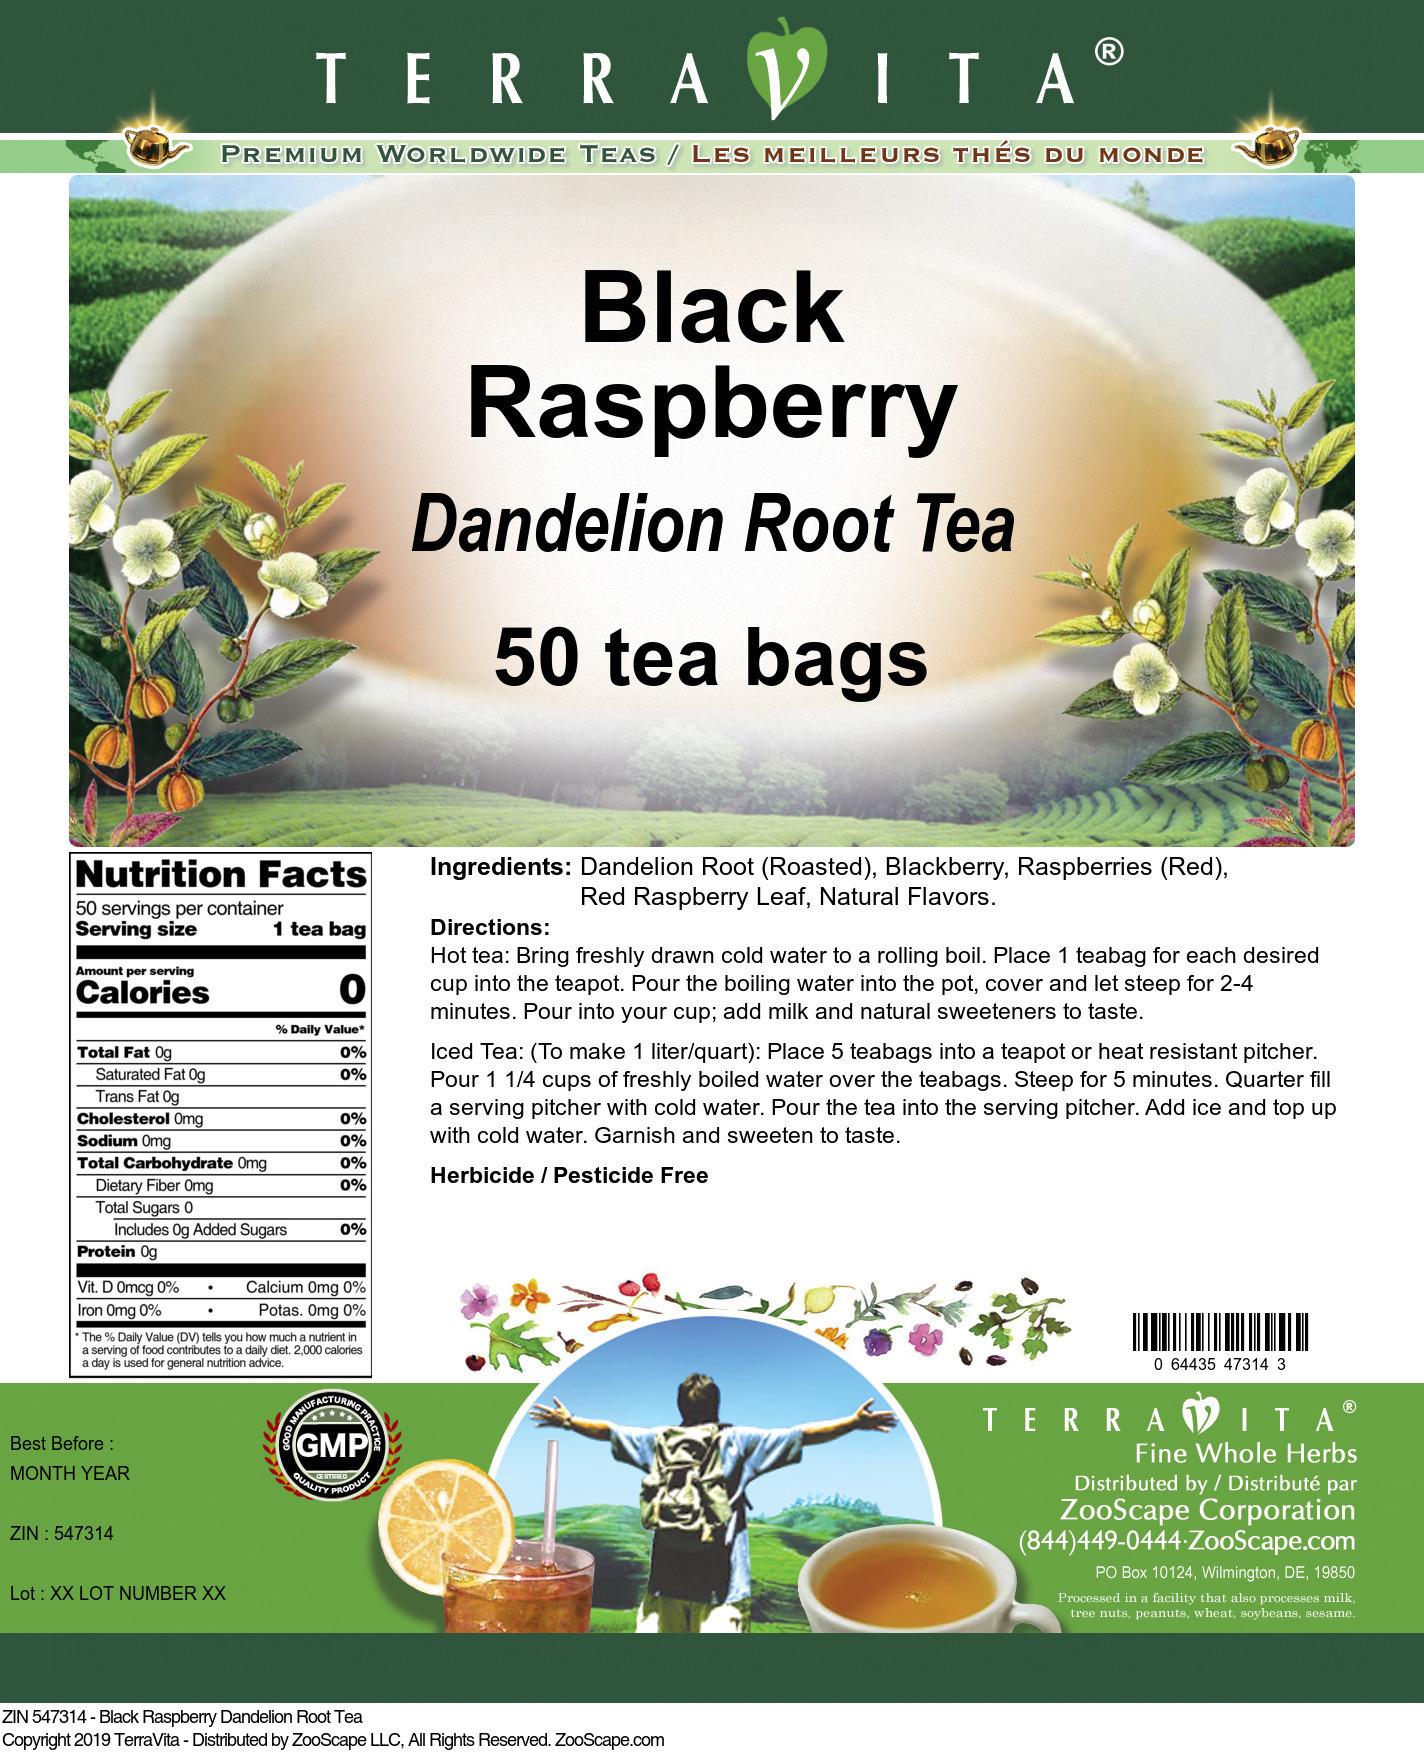 Black Raspberry Dandelion Root